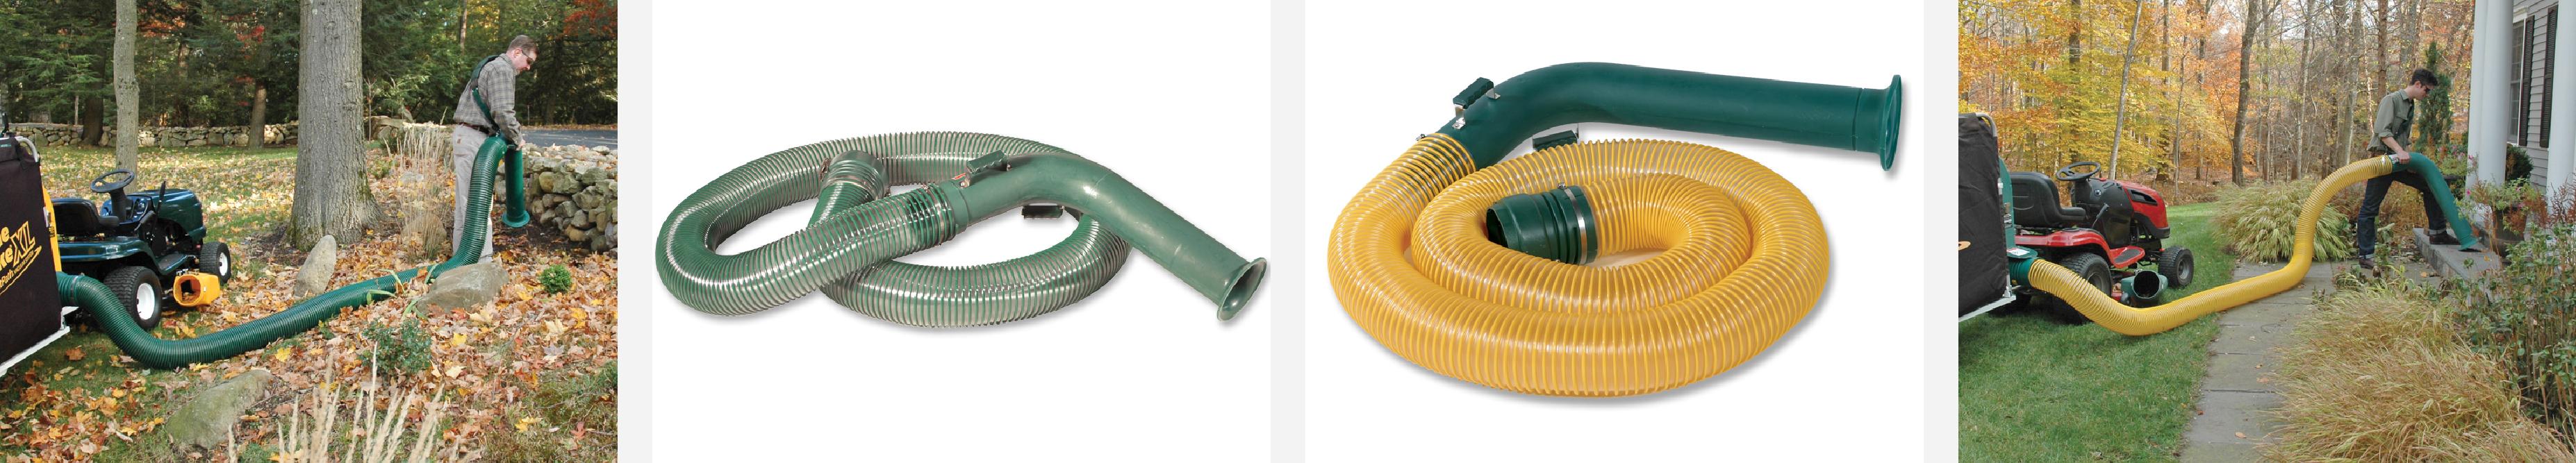 Cyclone Rake For Sale >> Cyclone Rake Vacuum Pickup | Pull Behind Lawn Vacuum ...